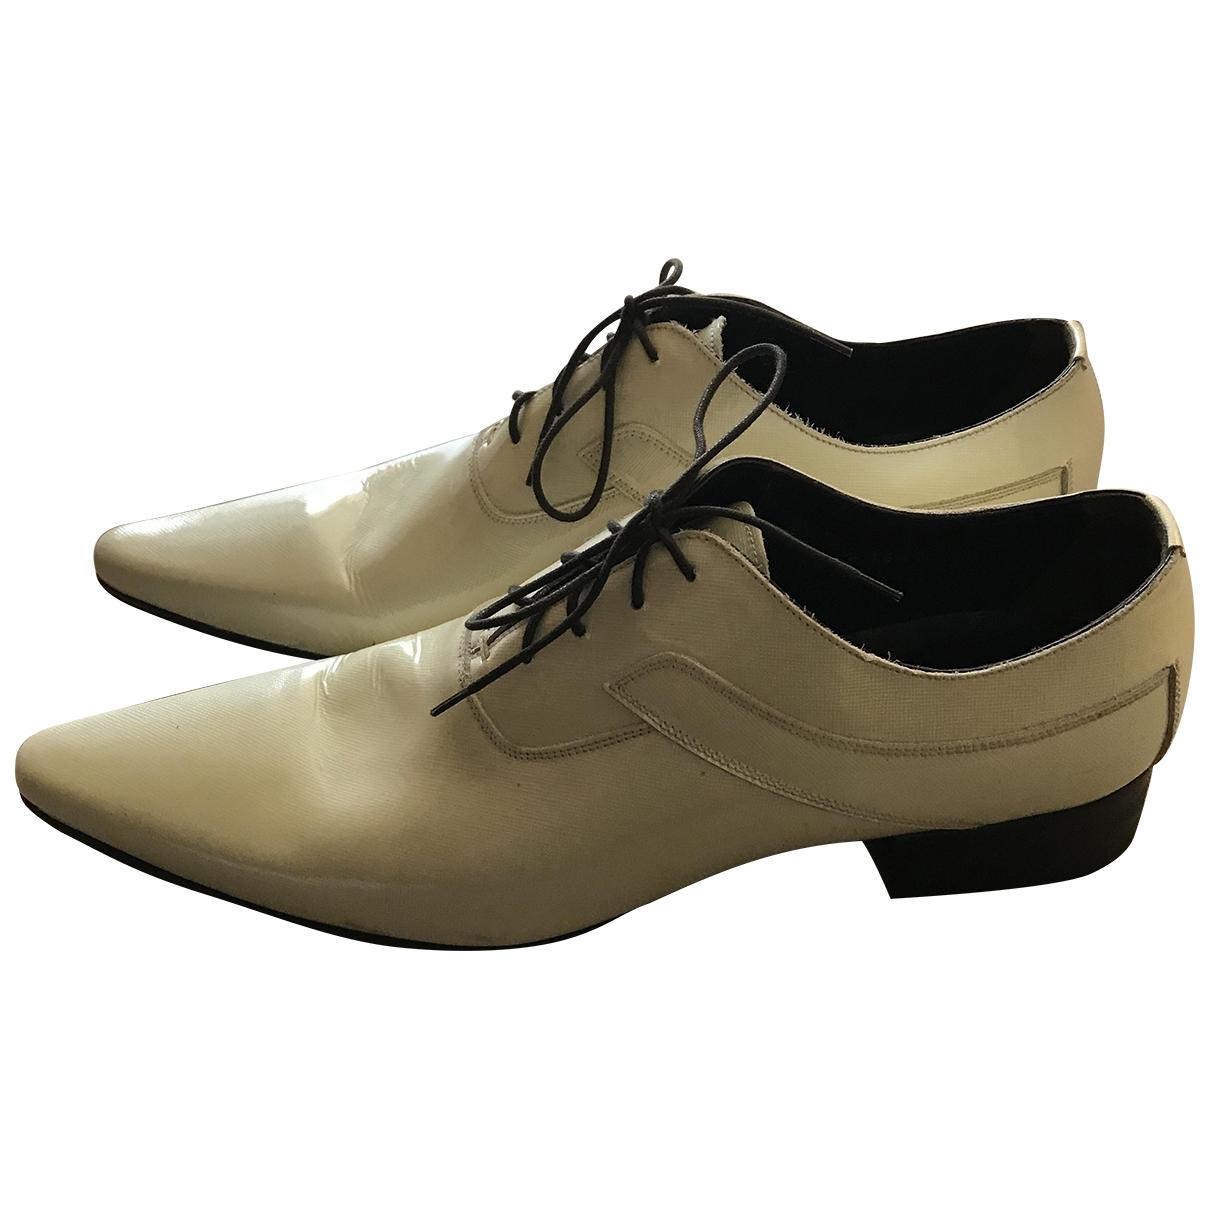 Dolce & Gabbana \N Ecru Patent leather Flats for Men 9.5 US